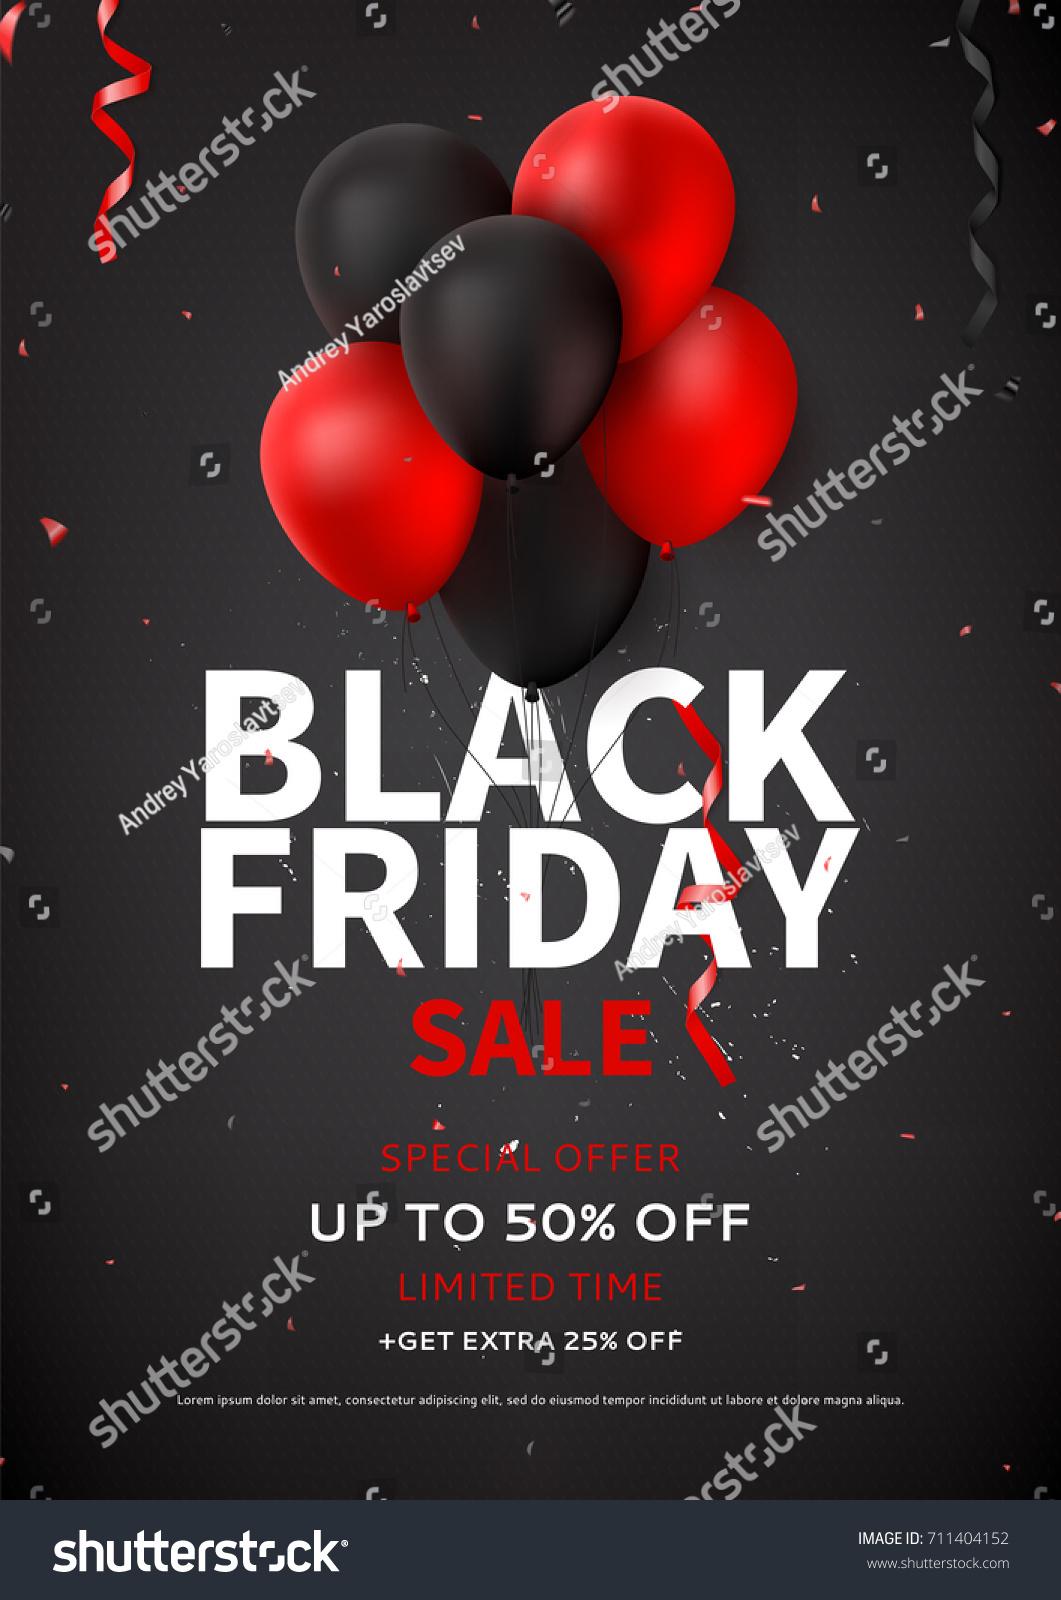 black friday sale flyer template dark stock vector 711404152 shutterstock. Black Bedroom Furniture Sets. Home Design Ideas